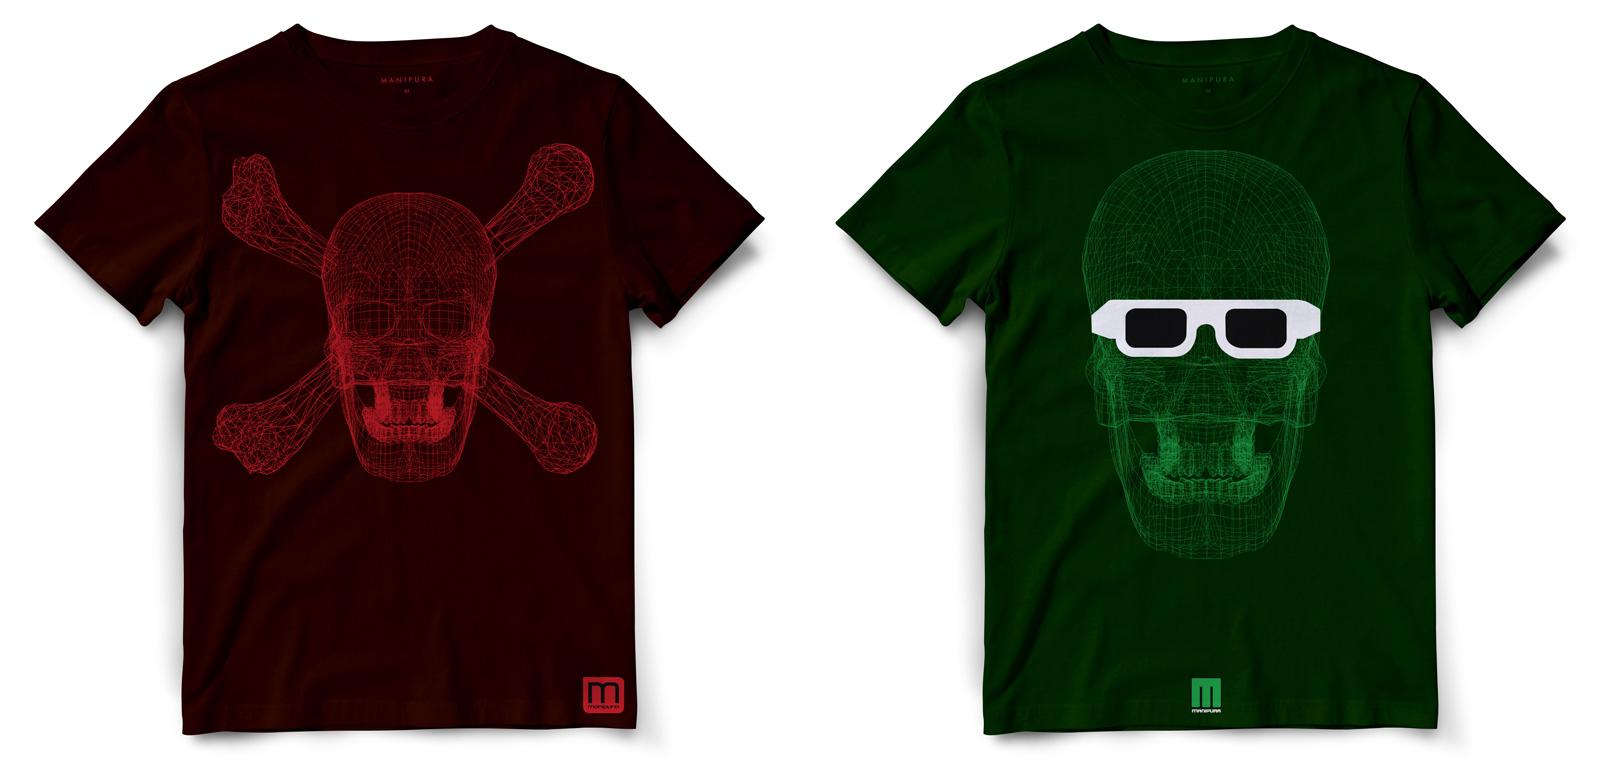 MANIPURA_shirt_2